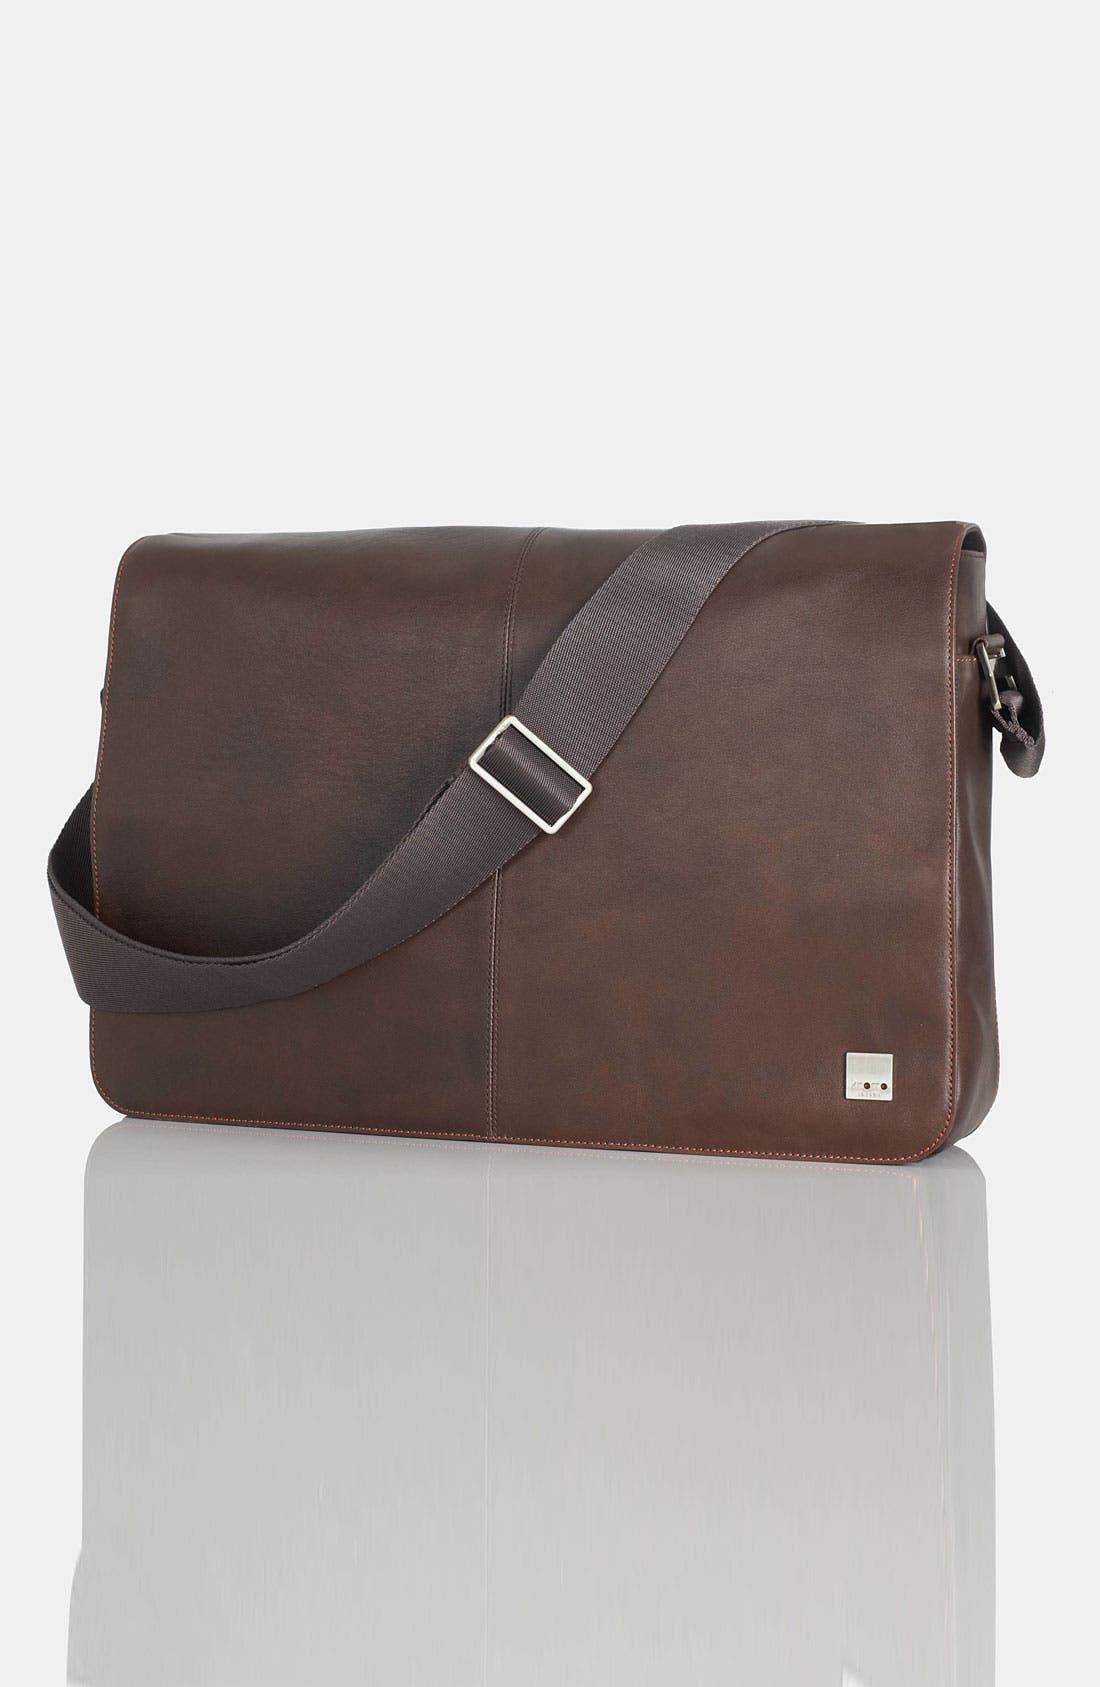 Main Image - KNOMO London 'Bungo' 17 Inch Messenger Bag